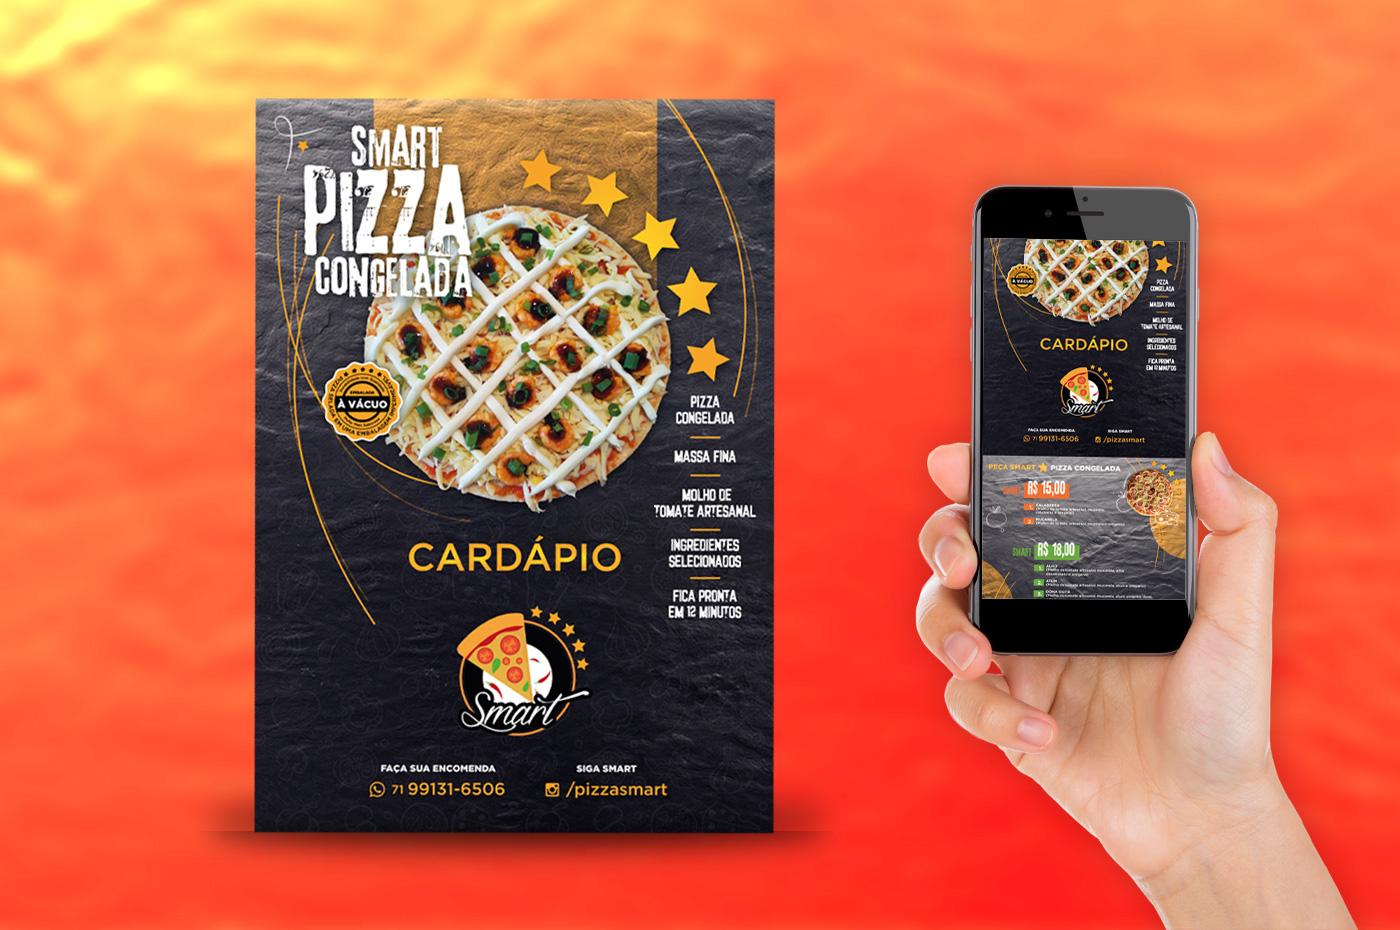 https://www.rafaeloliveira.com/portfolio/smart-pizza